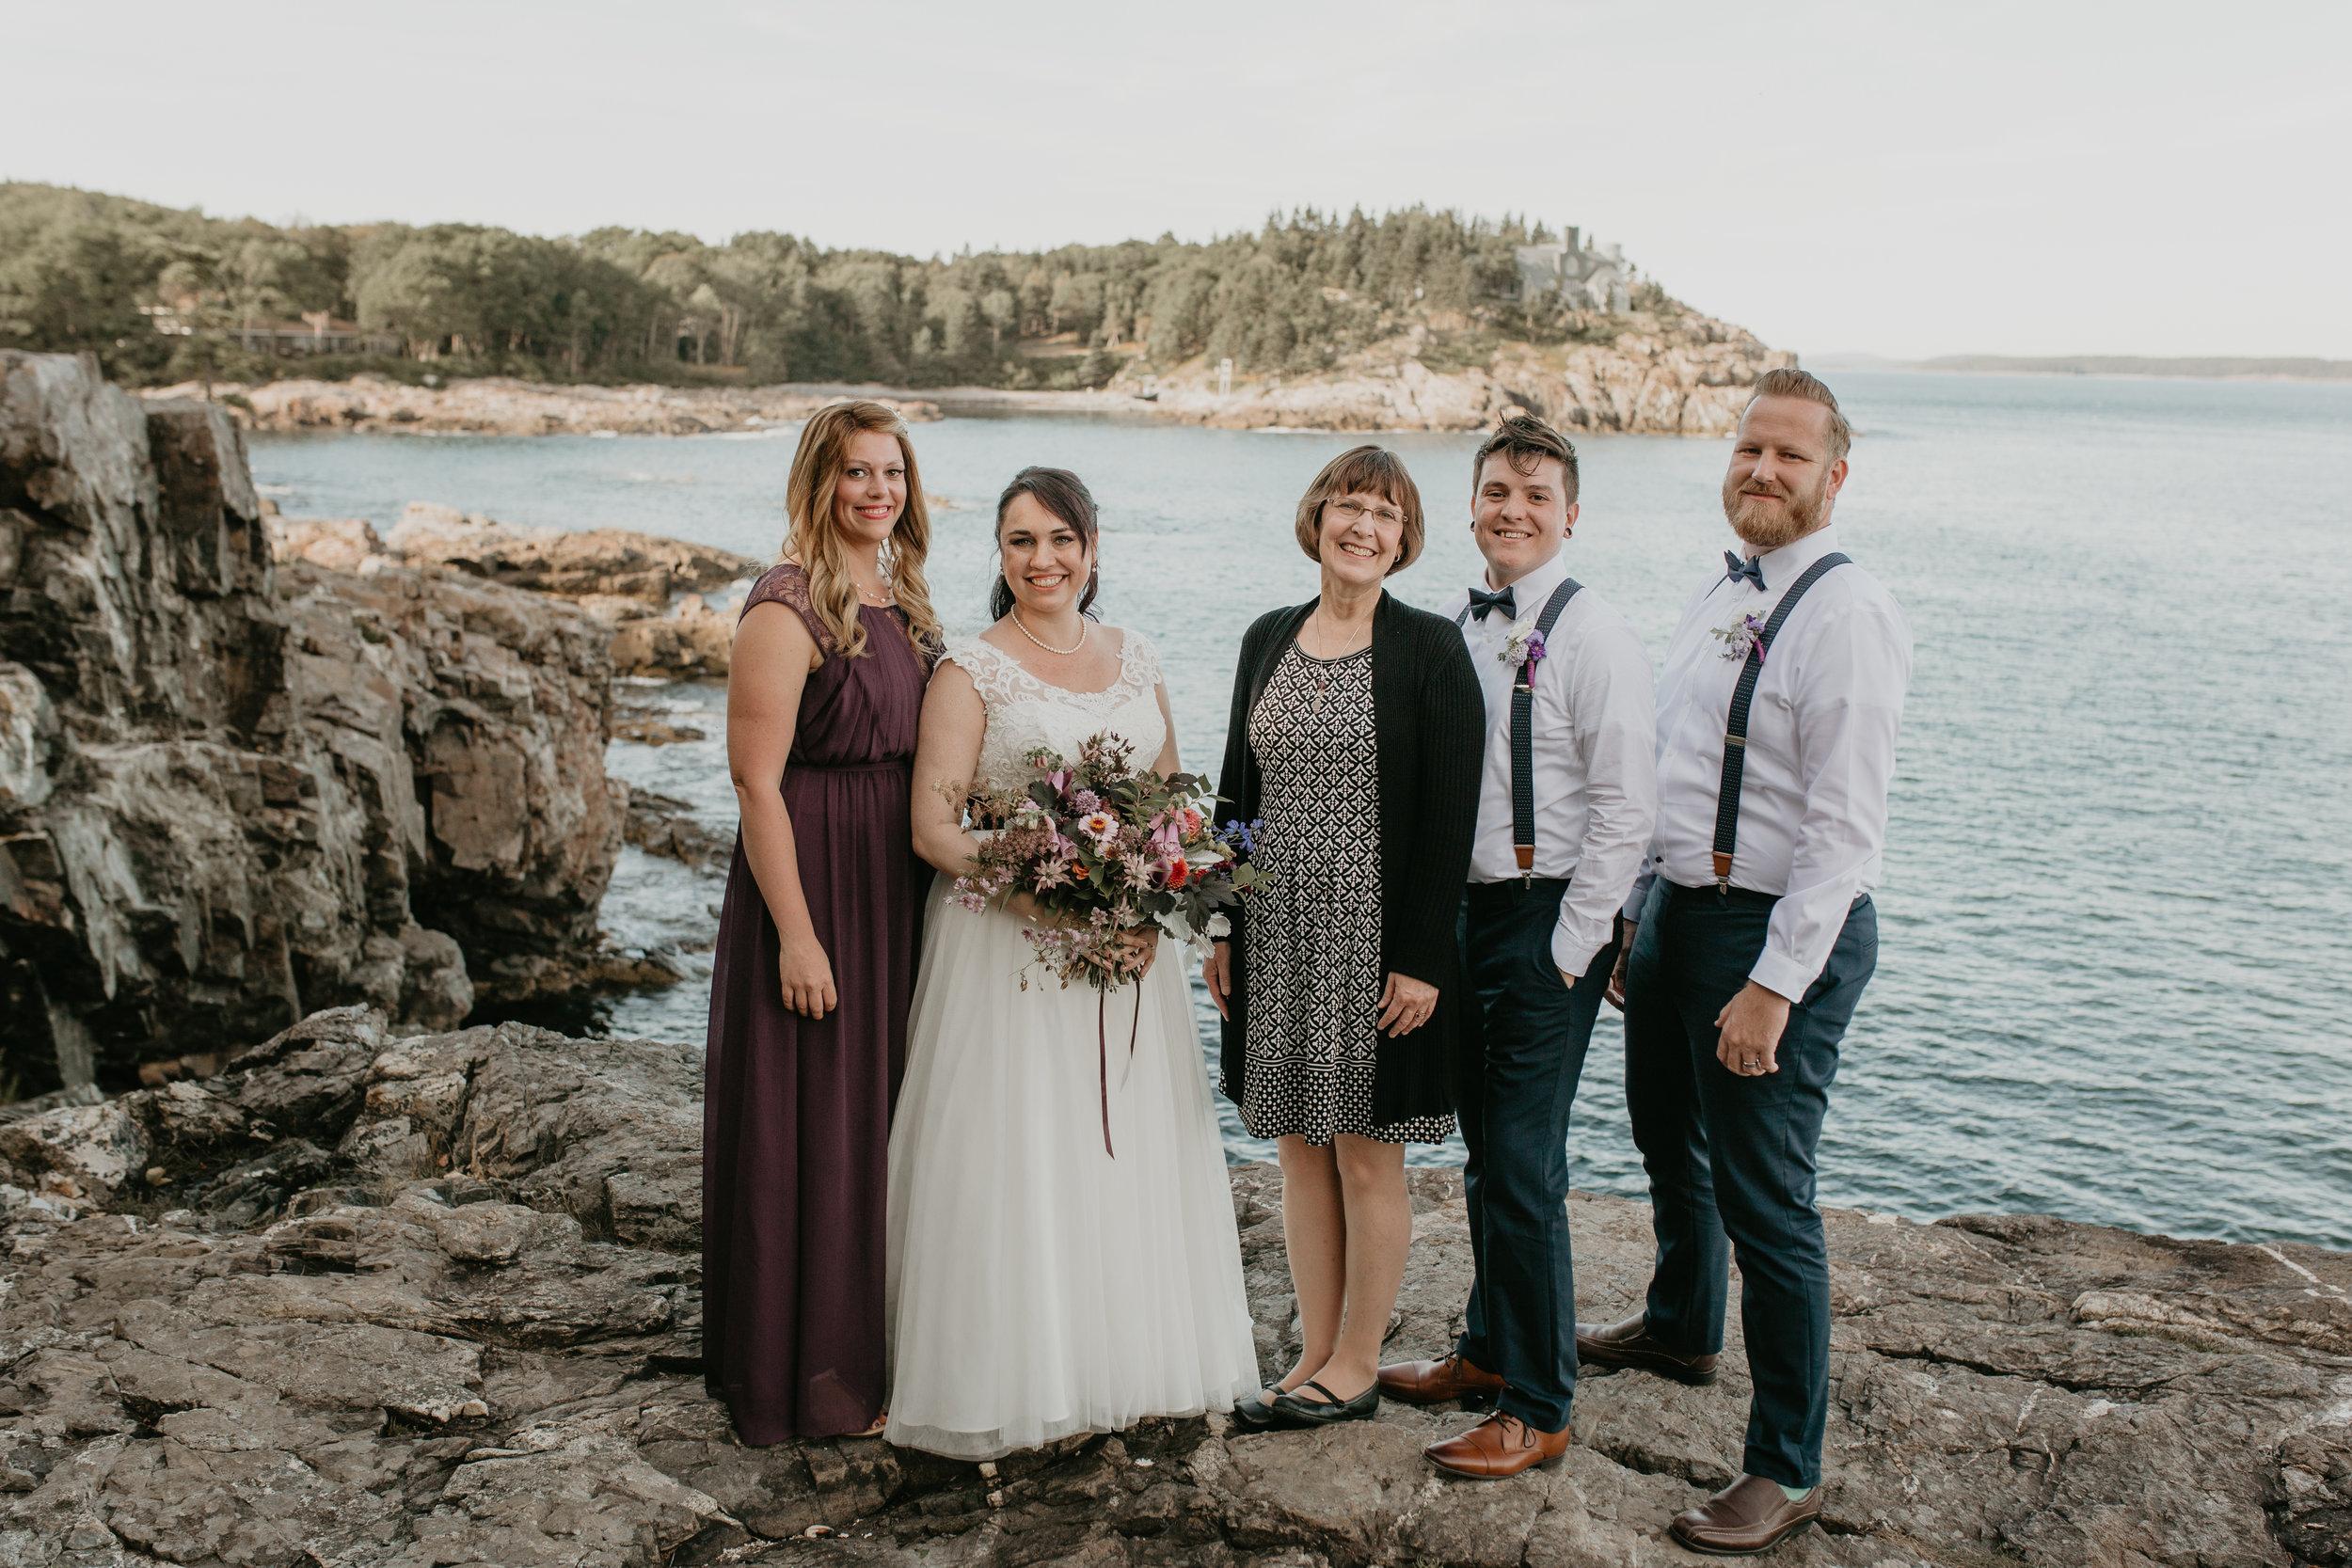 nicole-daacke-photography-Elopement-rocky-shoreline-coast-Acadia-National-Park-elopement-photographer-inspiration-maine-elopement-otter-cliffs-schoonic-head-point-29.jpg